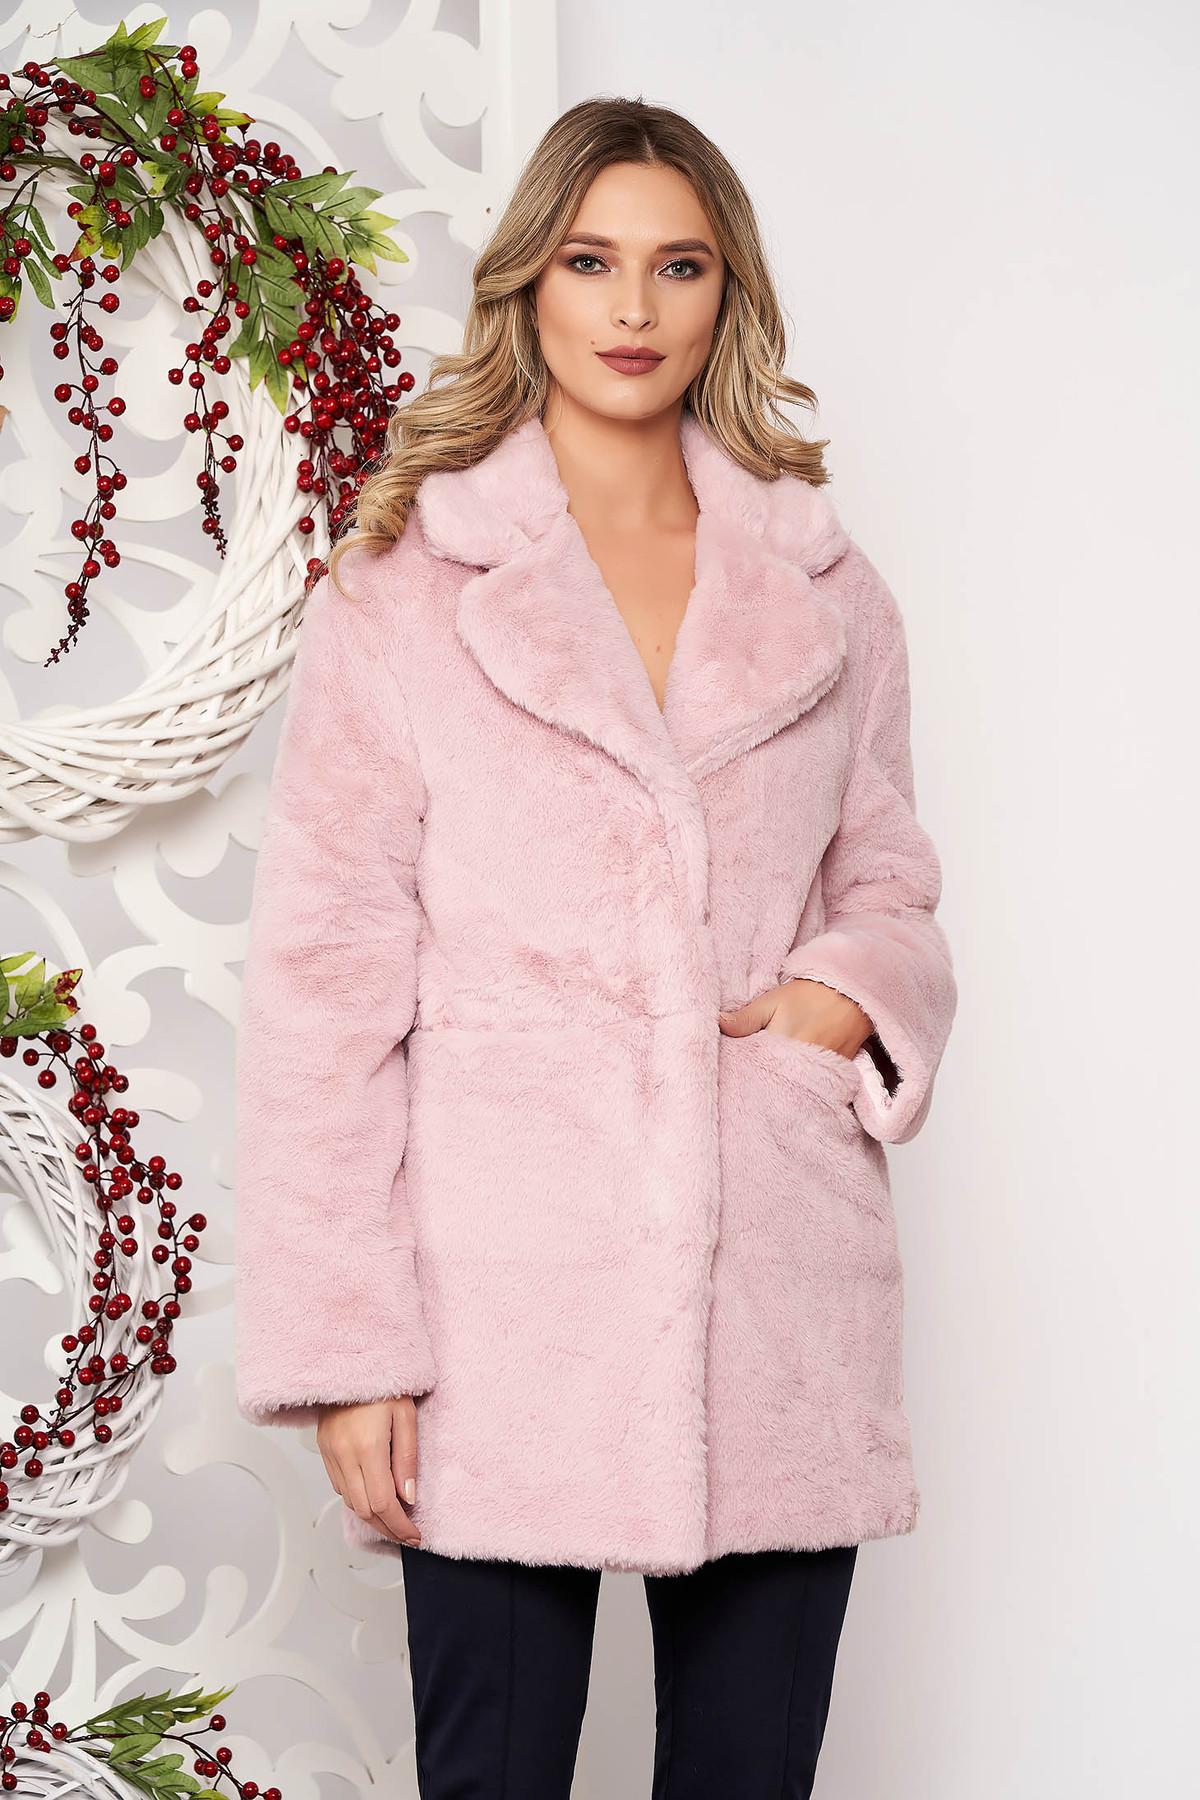 Blana SunShine roz prafuit cu buzunare cu maneci lungi accesorizat cu nasturi